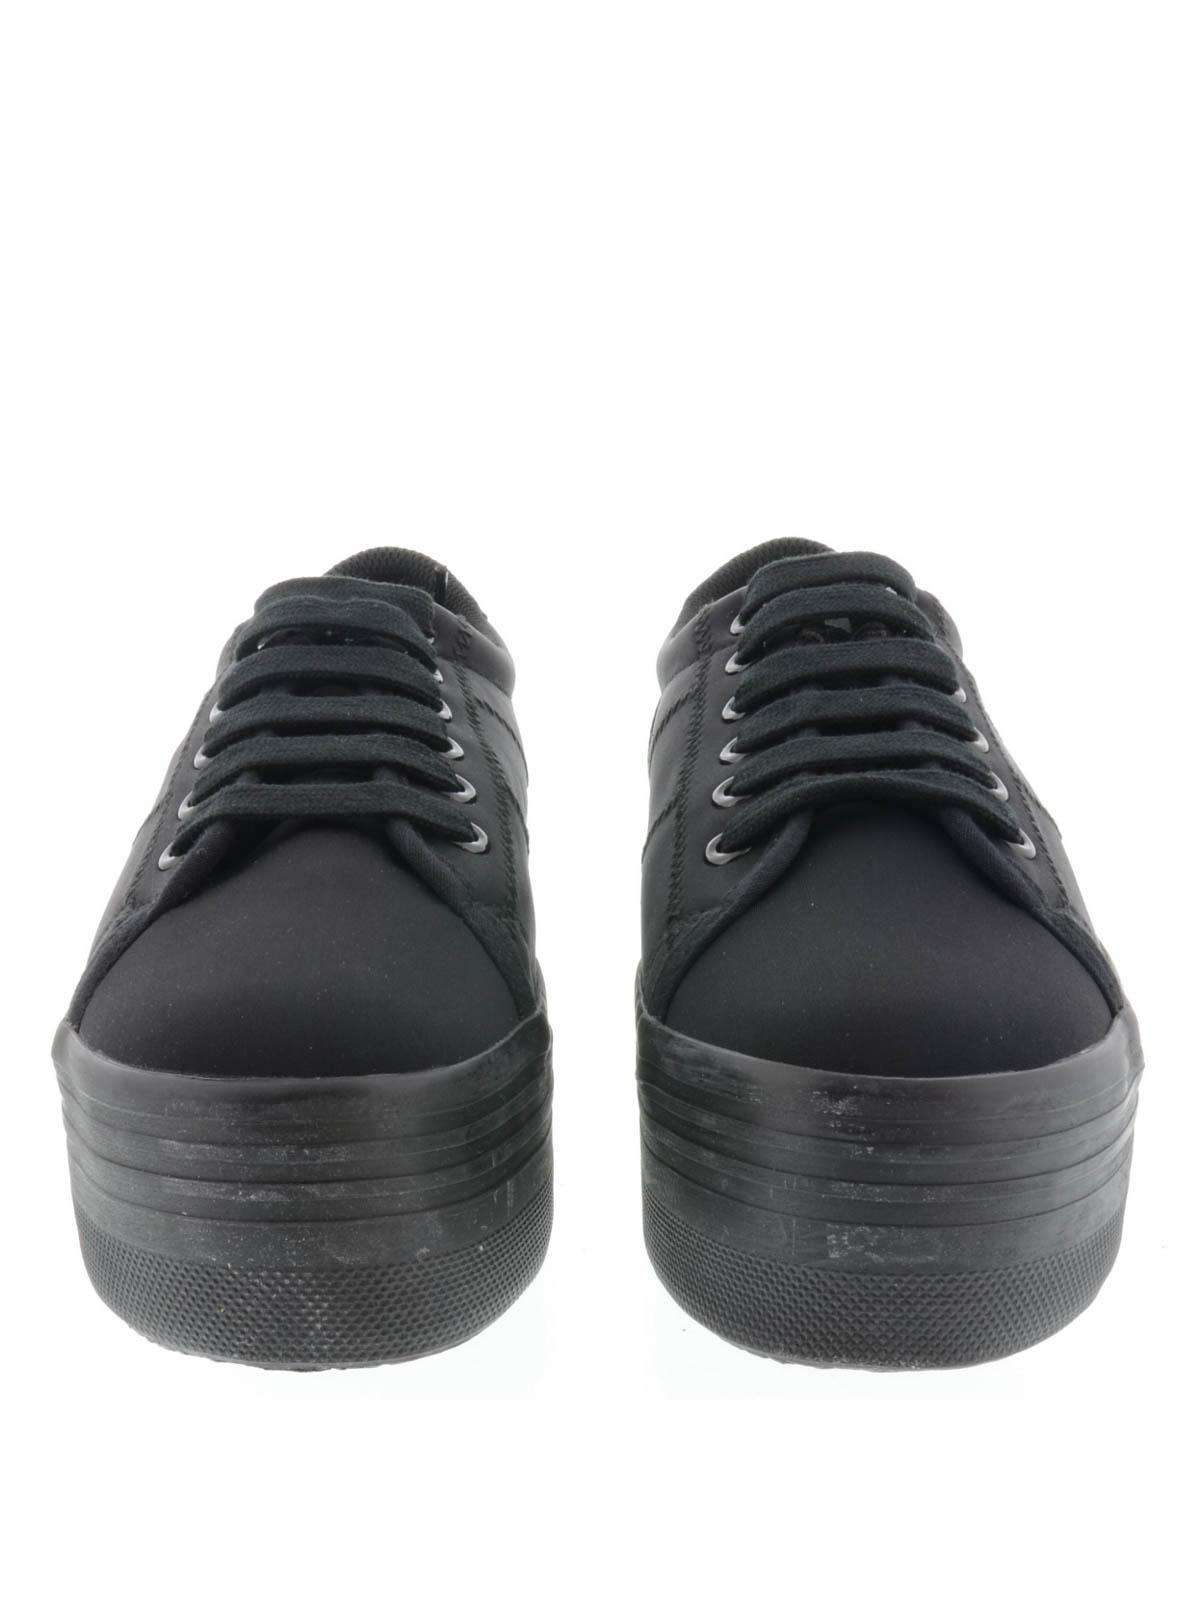 competitive price e2286 9e3a2 Jeffrey Campbell - - Sneaker - ZOMG NEOPRENEBLACK | iKRIX ...